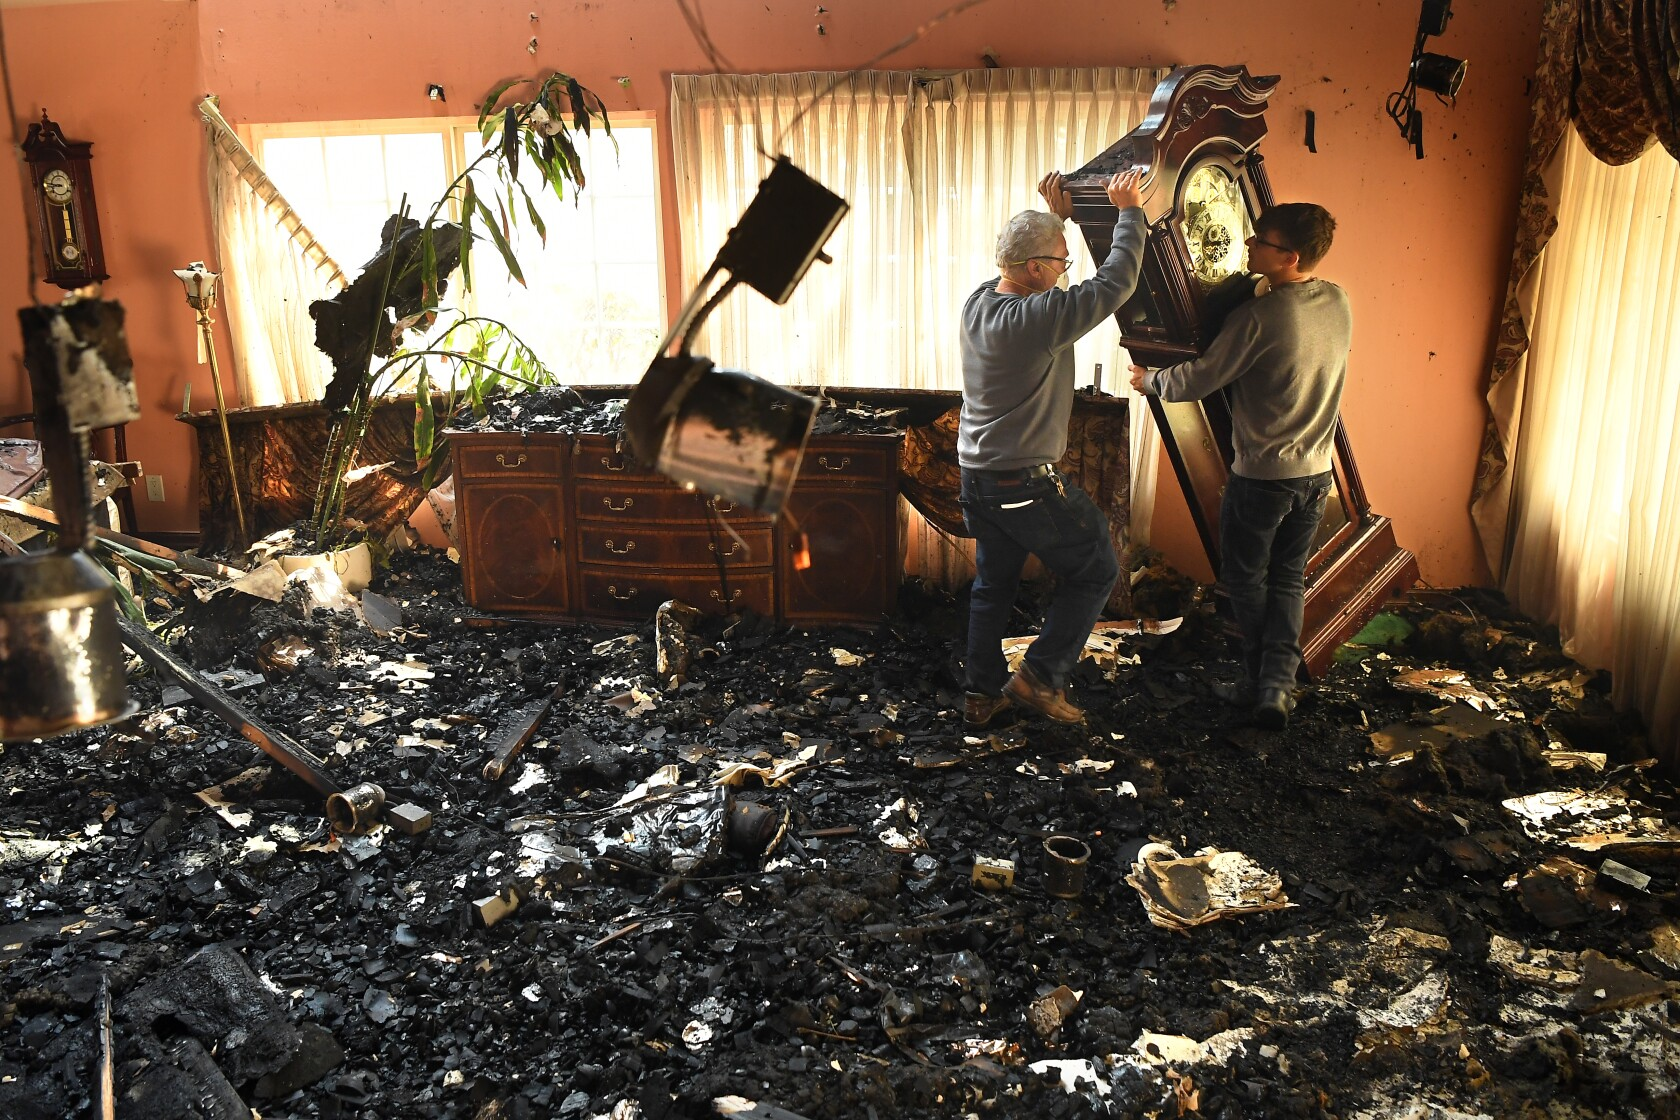 Saddleridge fire explodes to 4,700 acres, burns 25 homes in San Fernando Valley